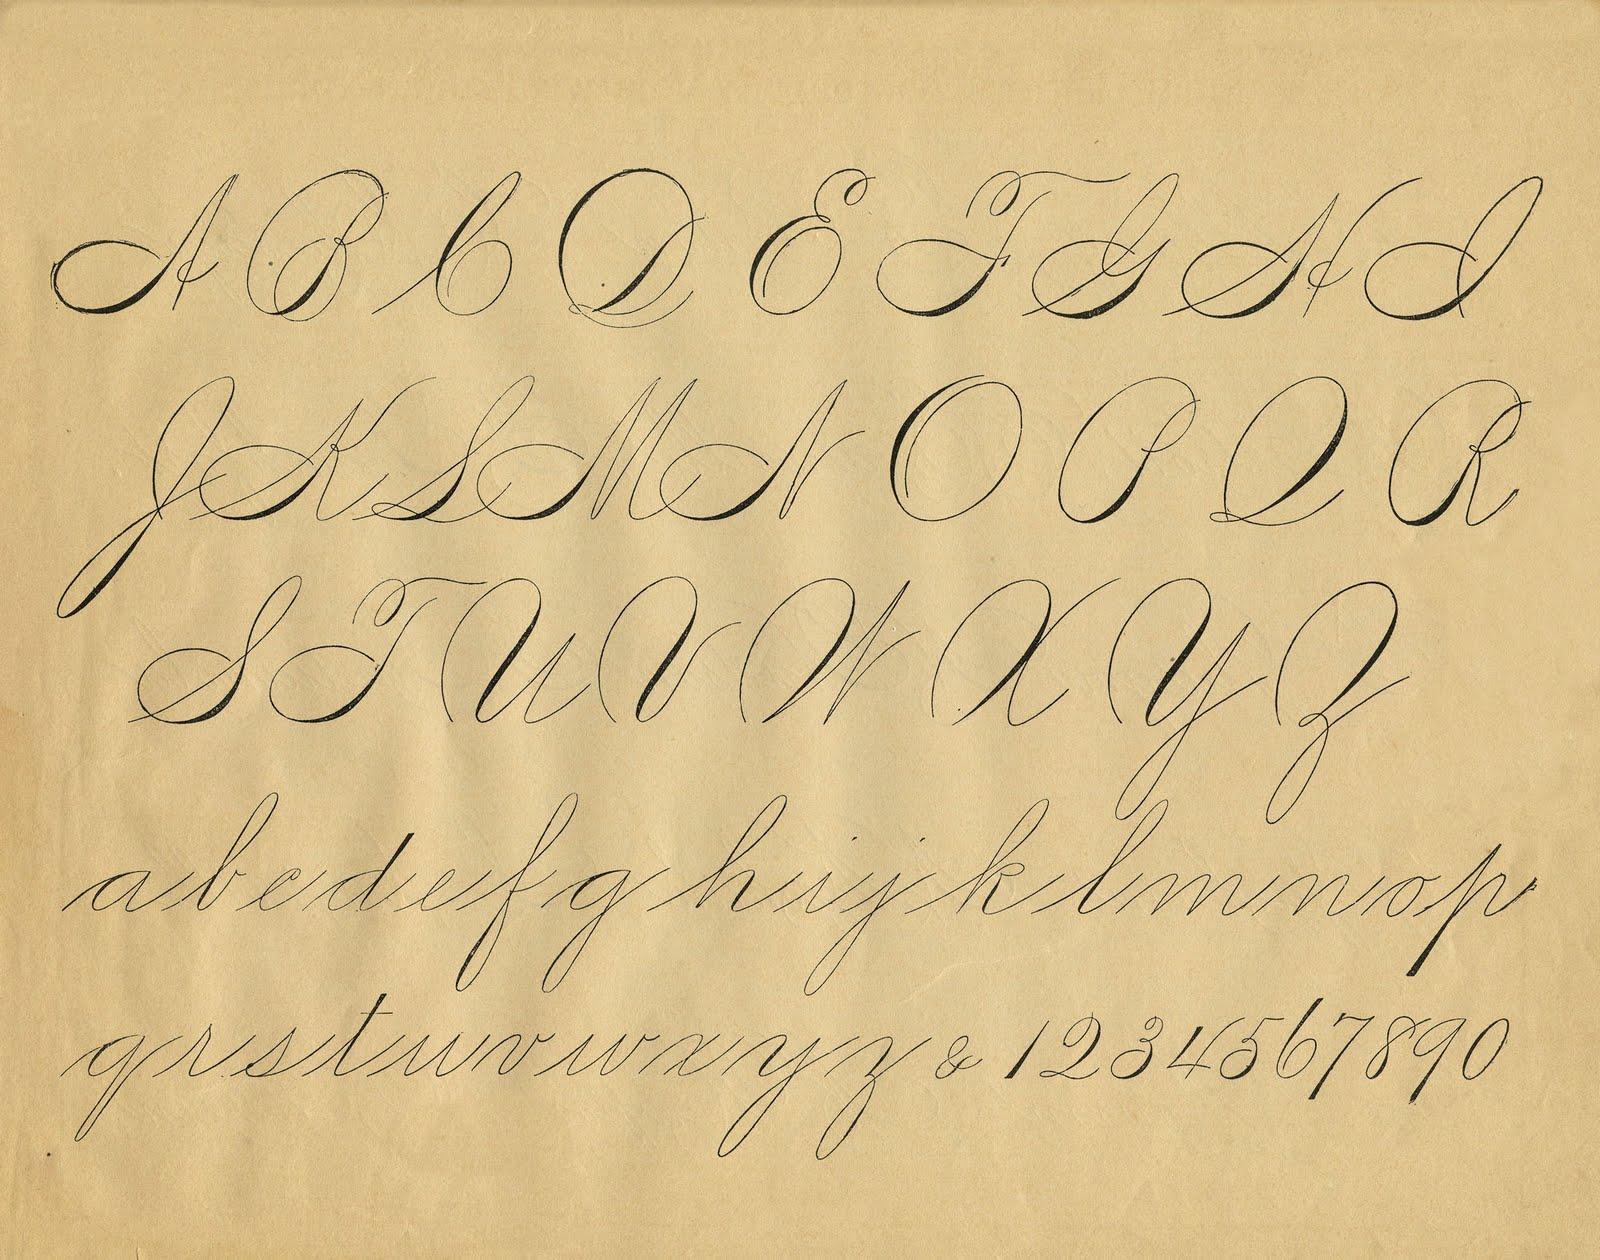 Alphabet Clipart Calligraphy Alphabet Calligraphy